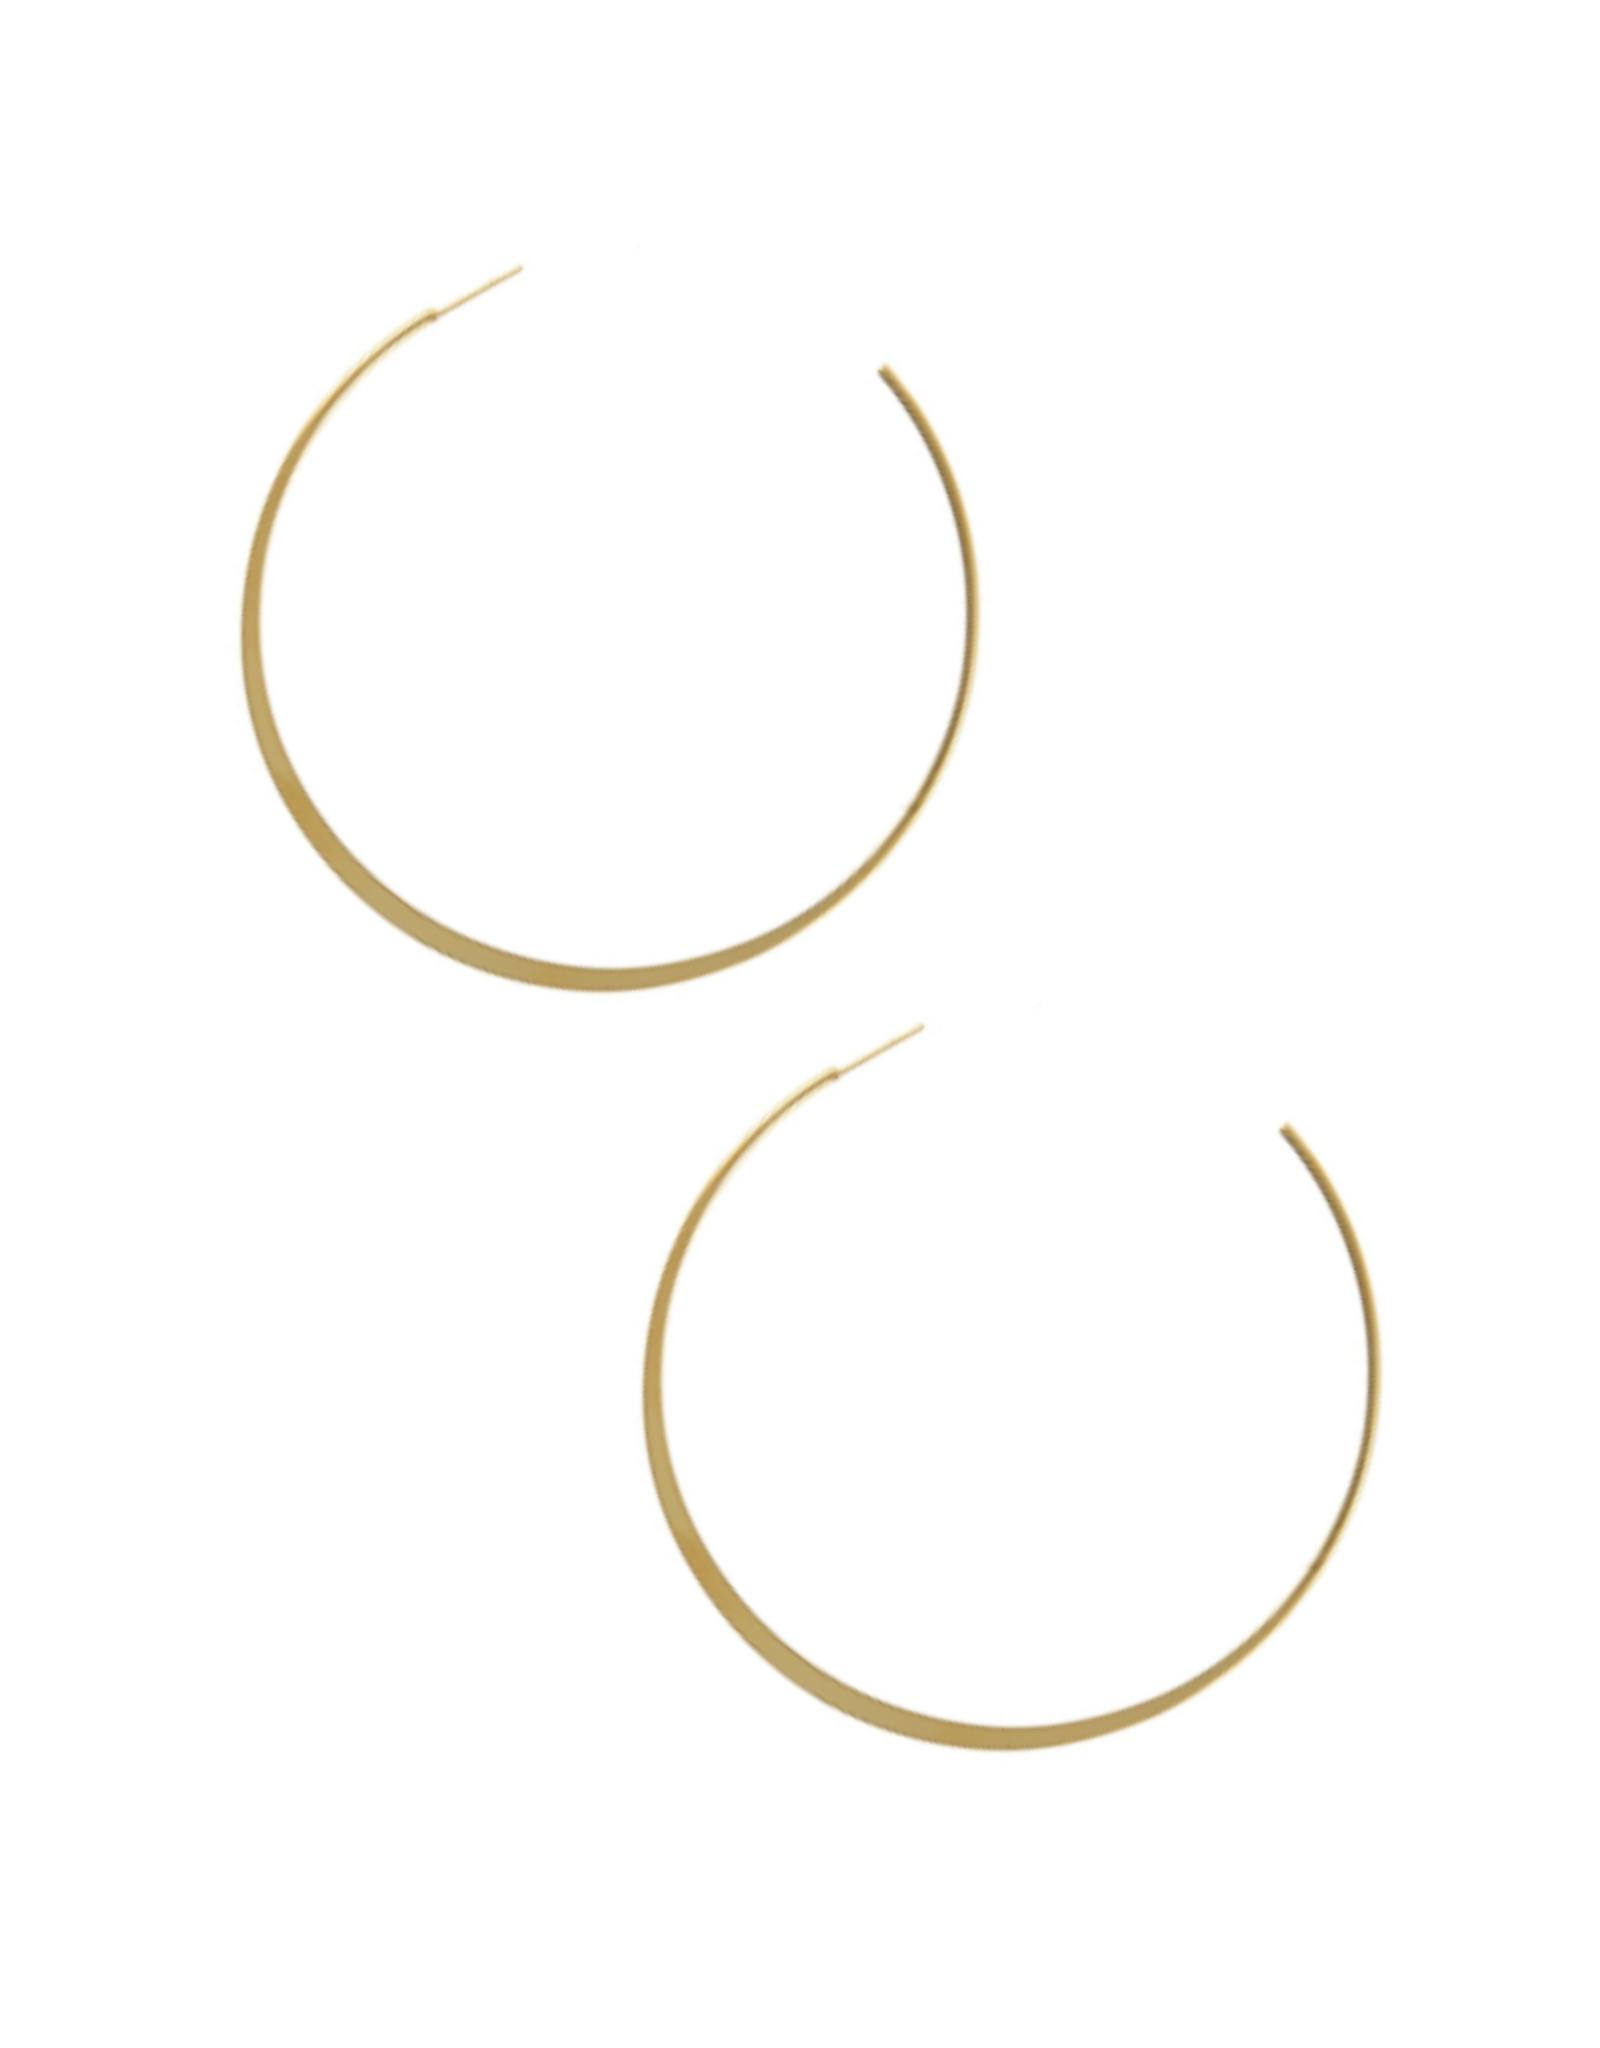 EARRINGS-GOLD DIPPED THICKER BOTTOM HOOP